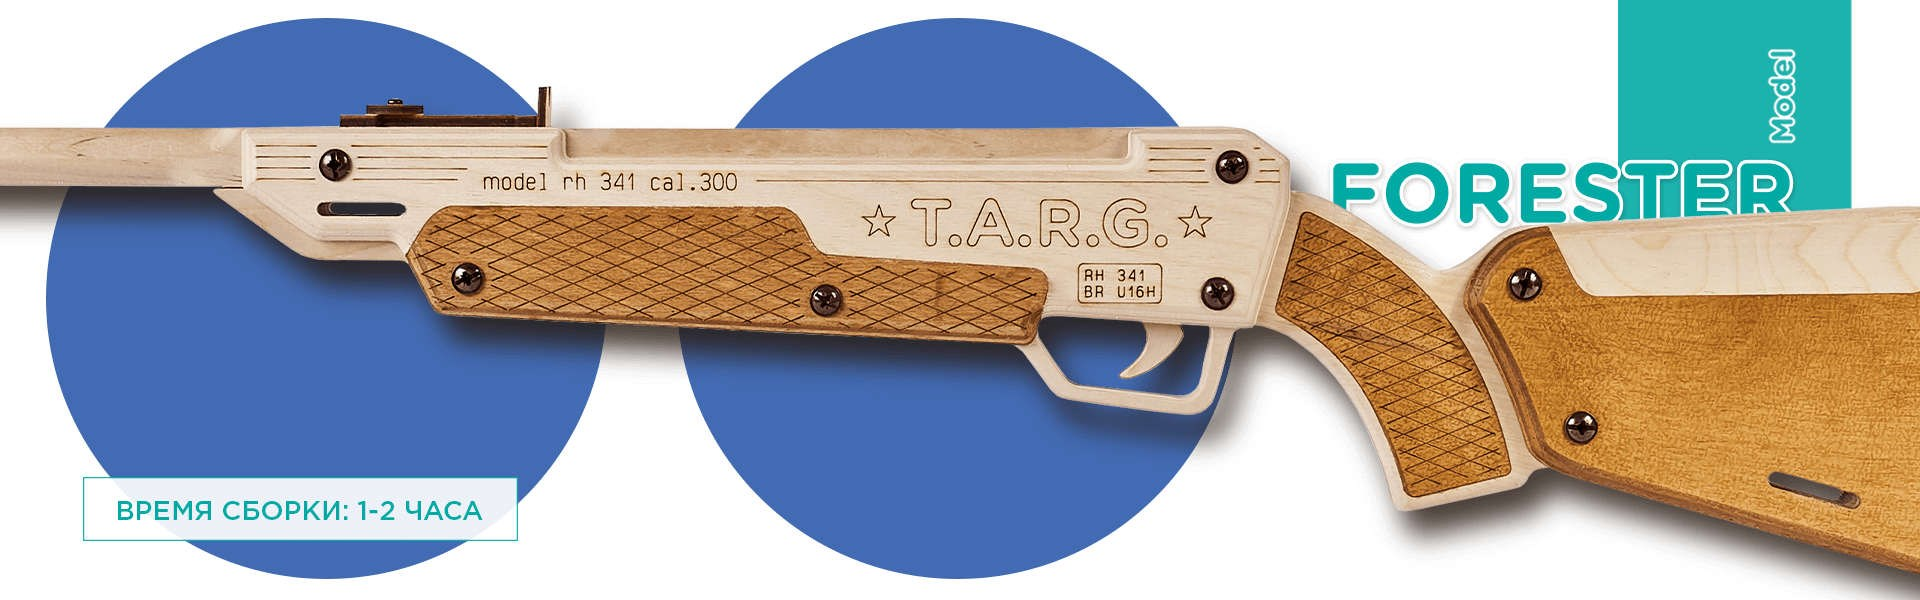 Сборная модель T.A.R.G. FORESTER - фото 4916